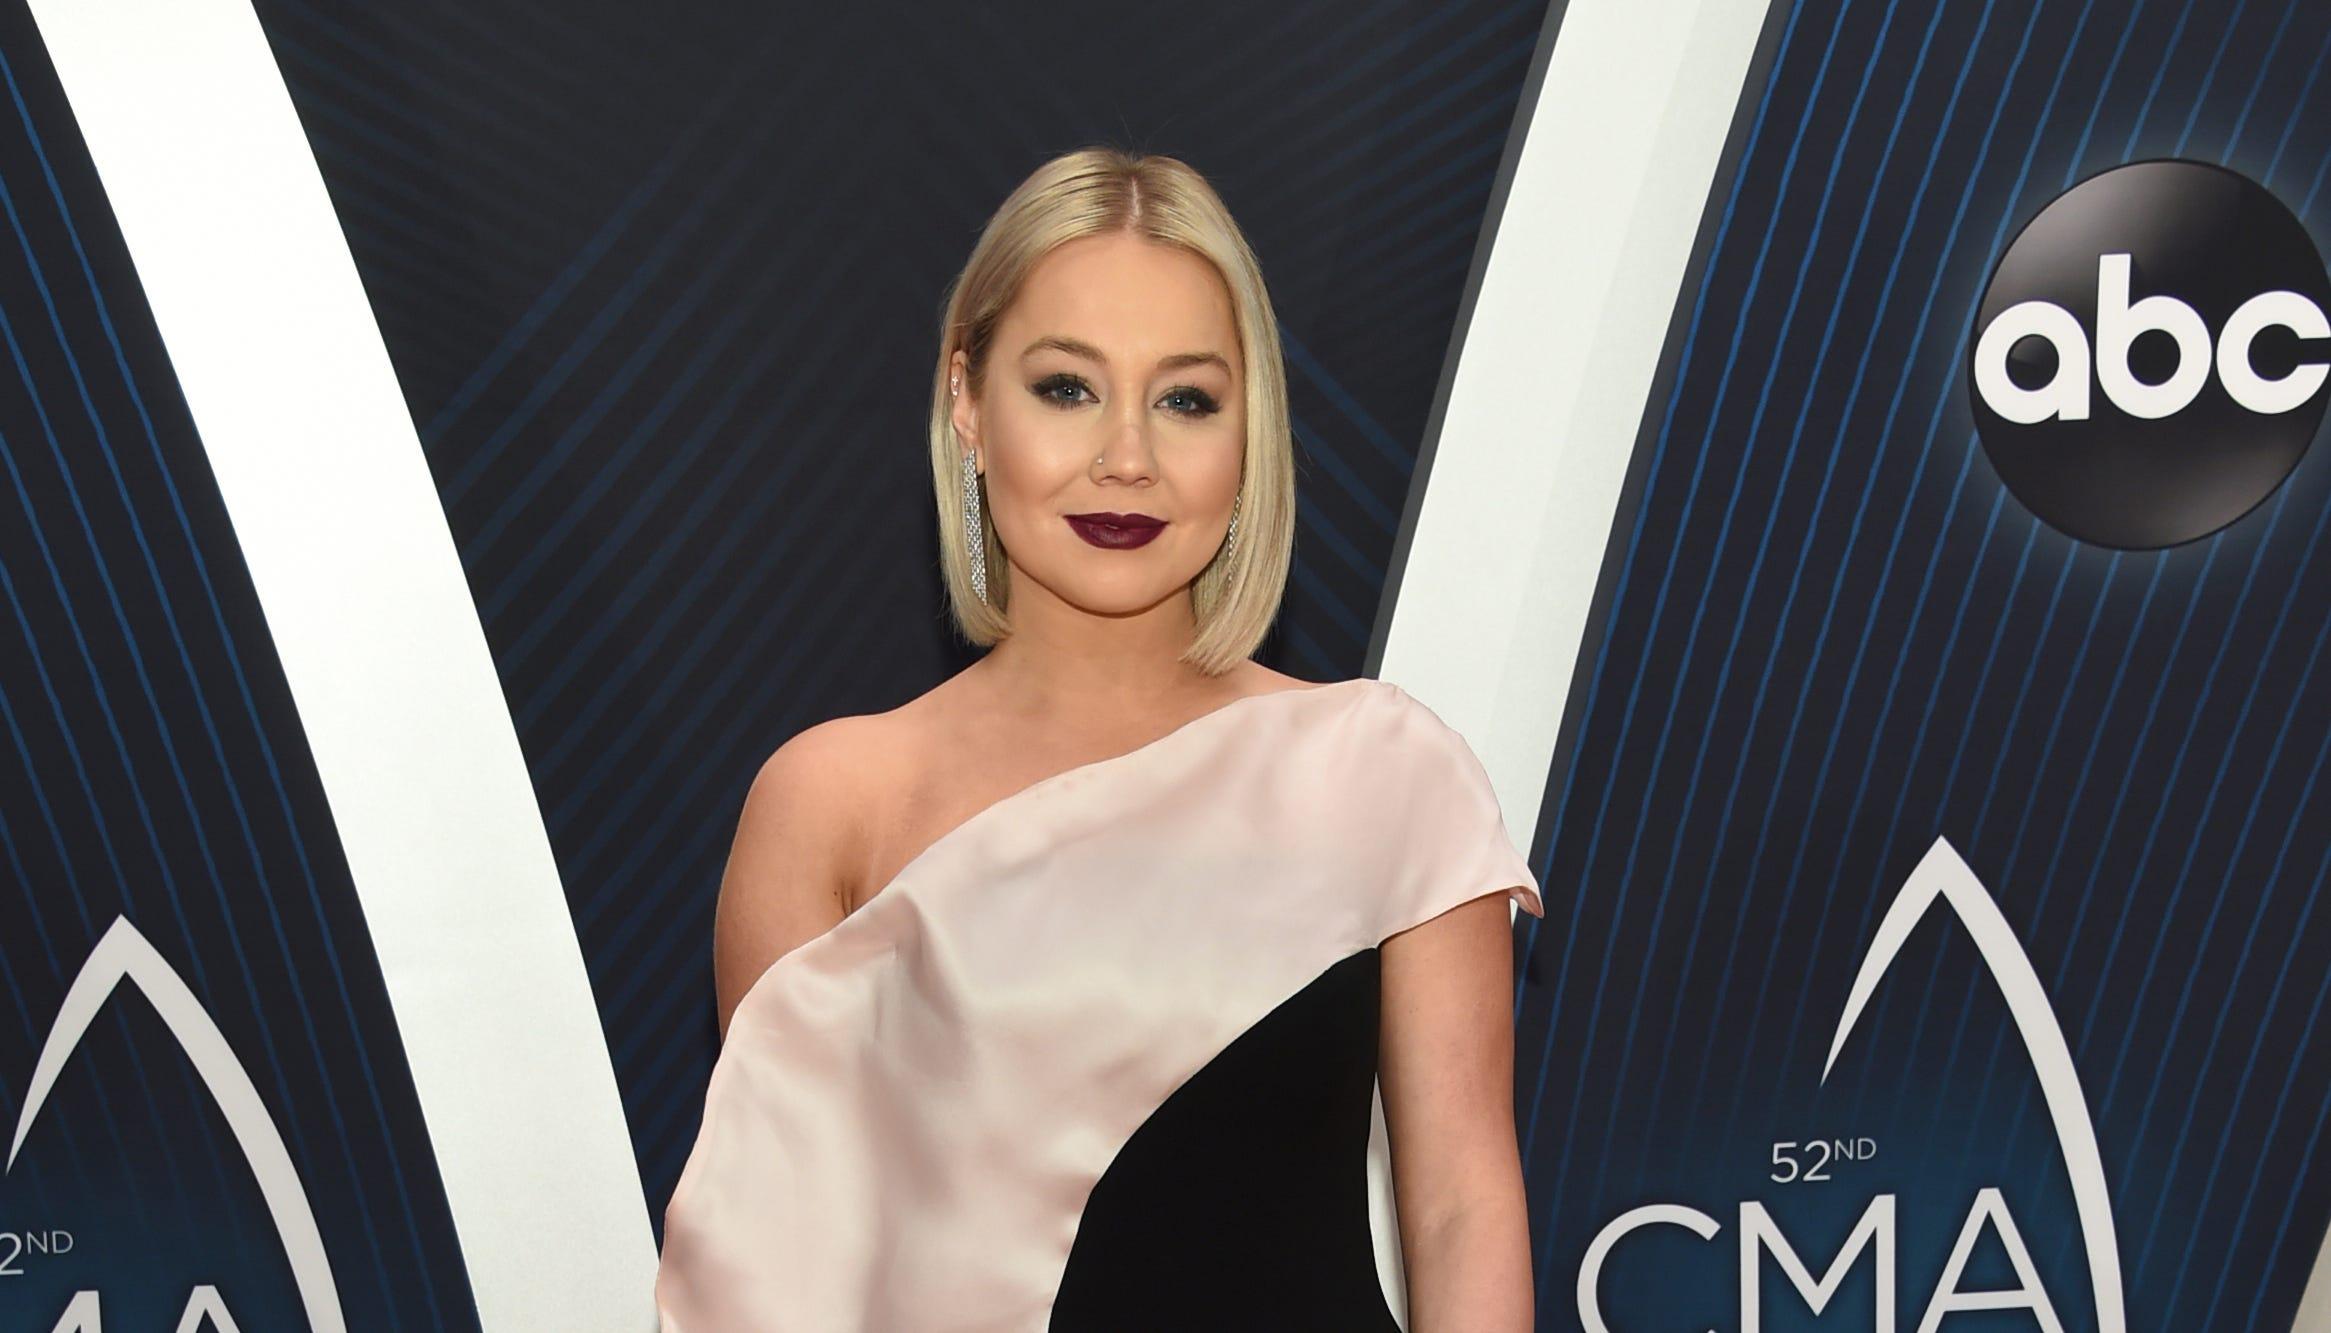 RaeLynn arrives at the 52nd annual CMA Awards at Bridgestone Arena on Wednesday, Nov. 14, 2018, in Nashville, Tenn.